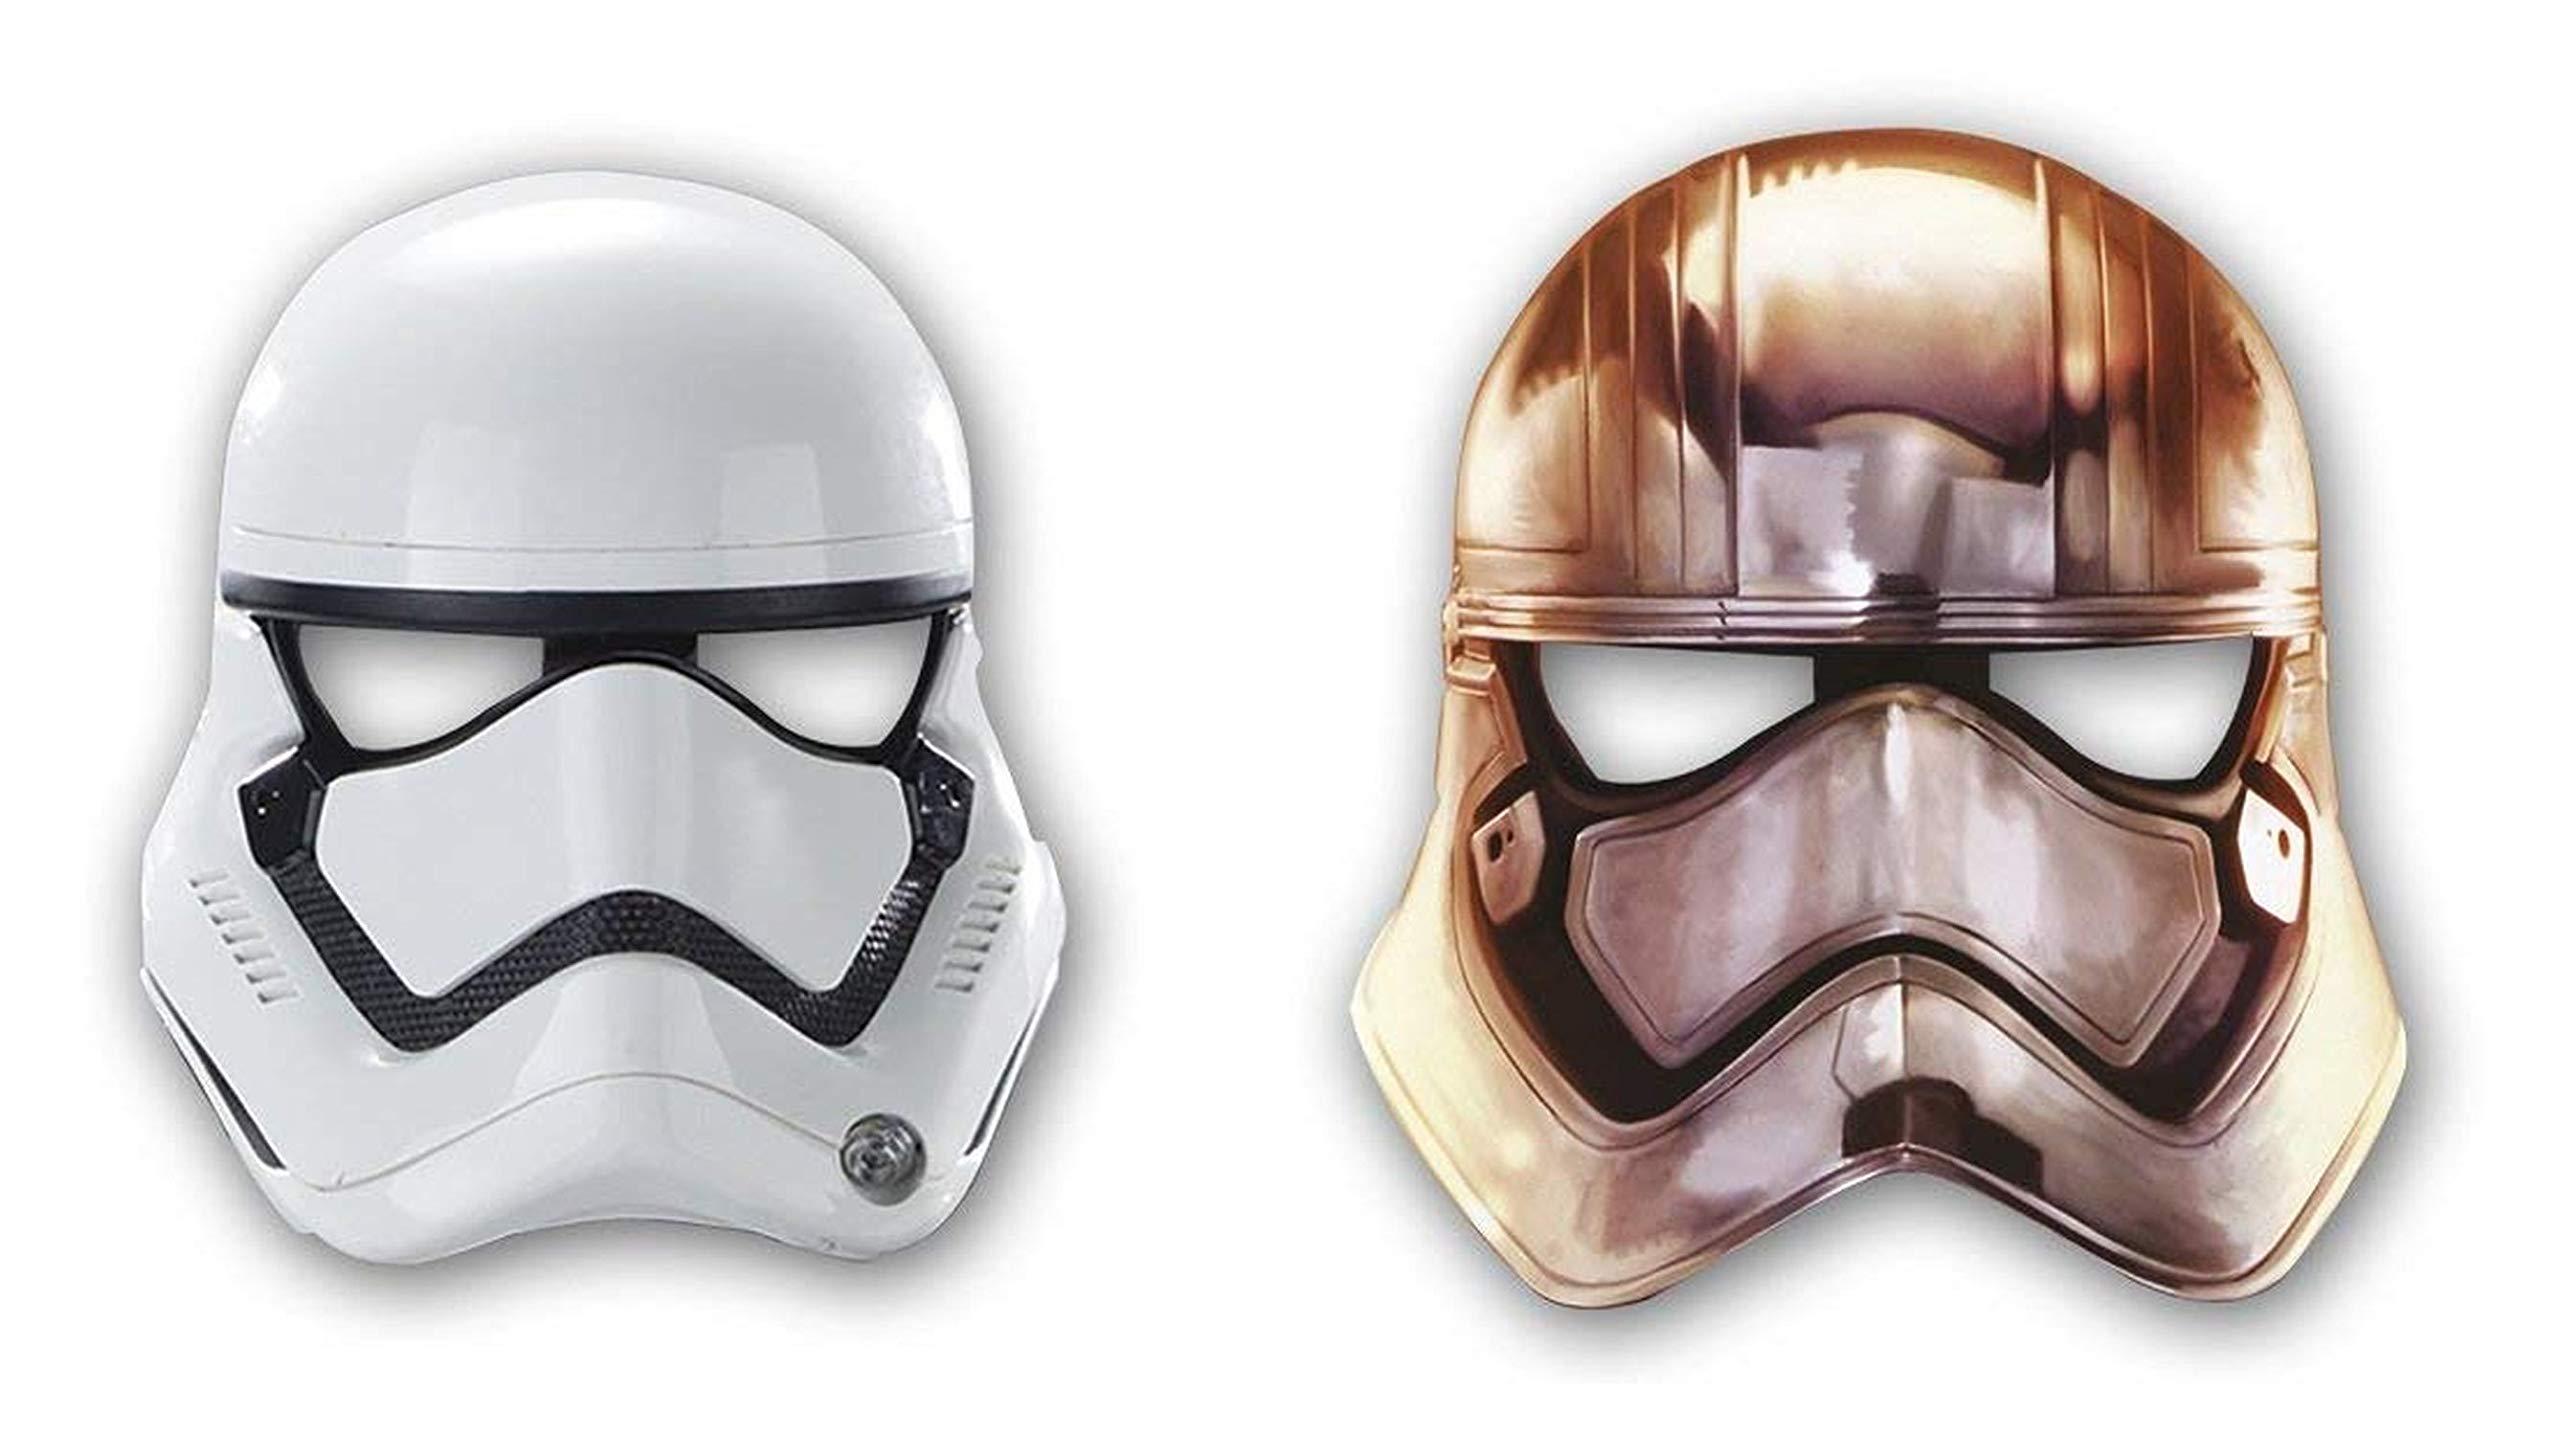 Star Wars Mask 6 pack